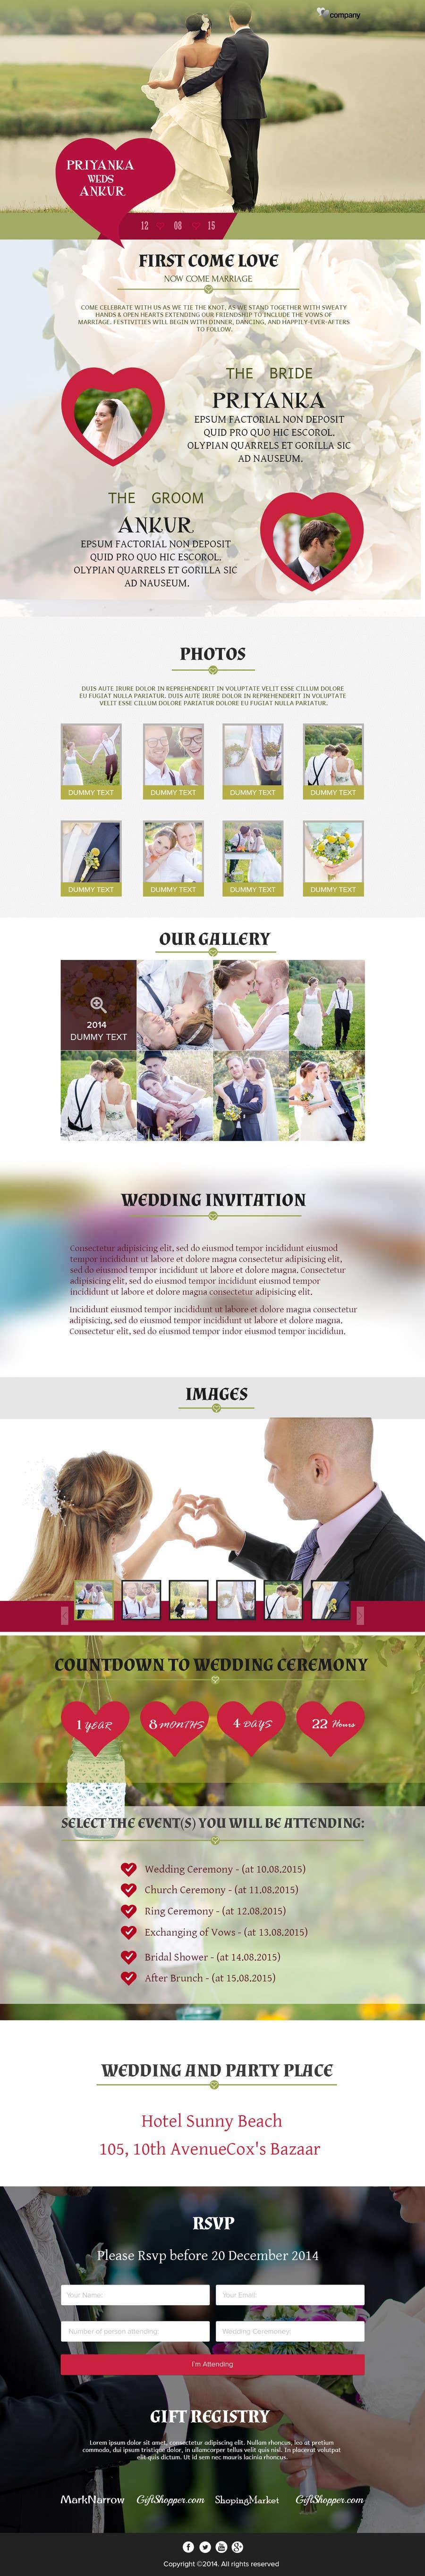 Penyertaan Peraduan #                                        4                                      untuk                                         Wedding design - one page template